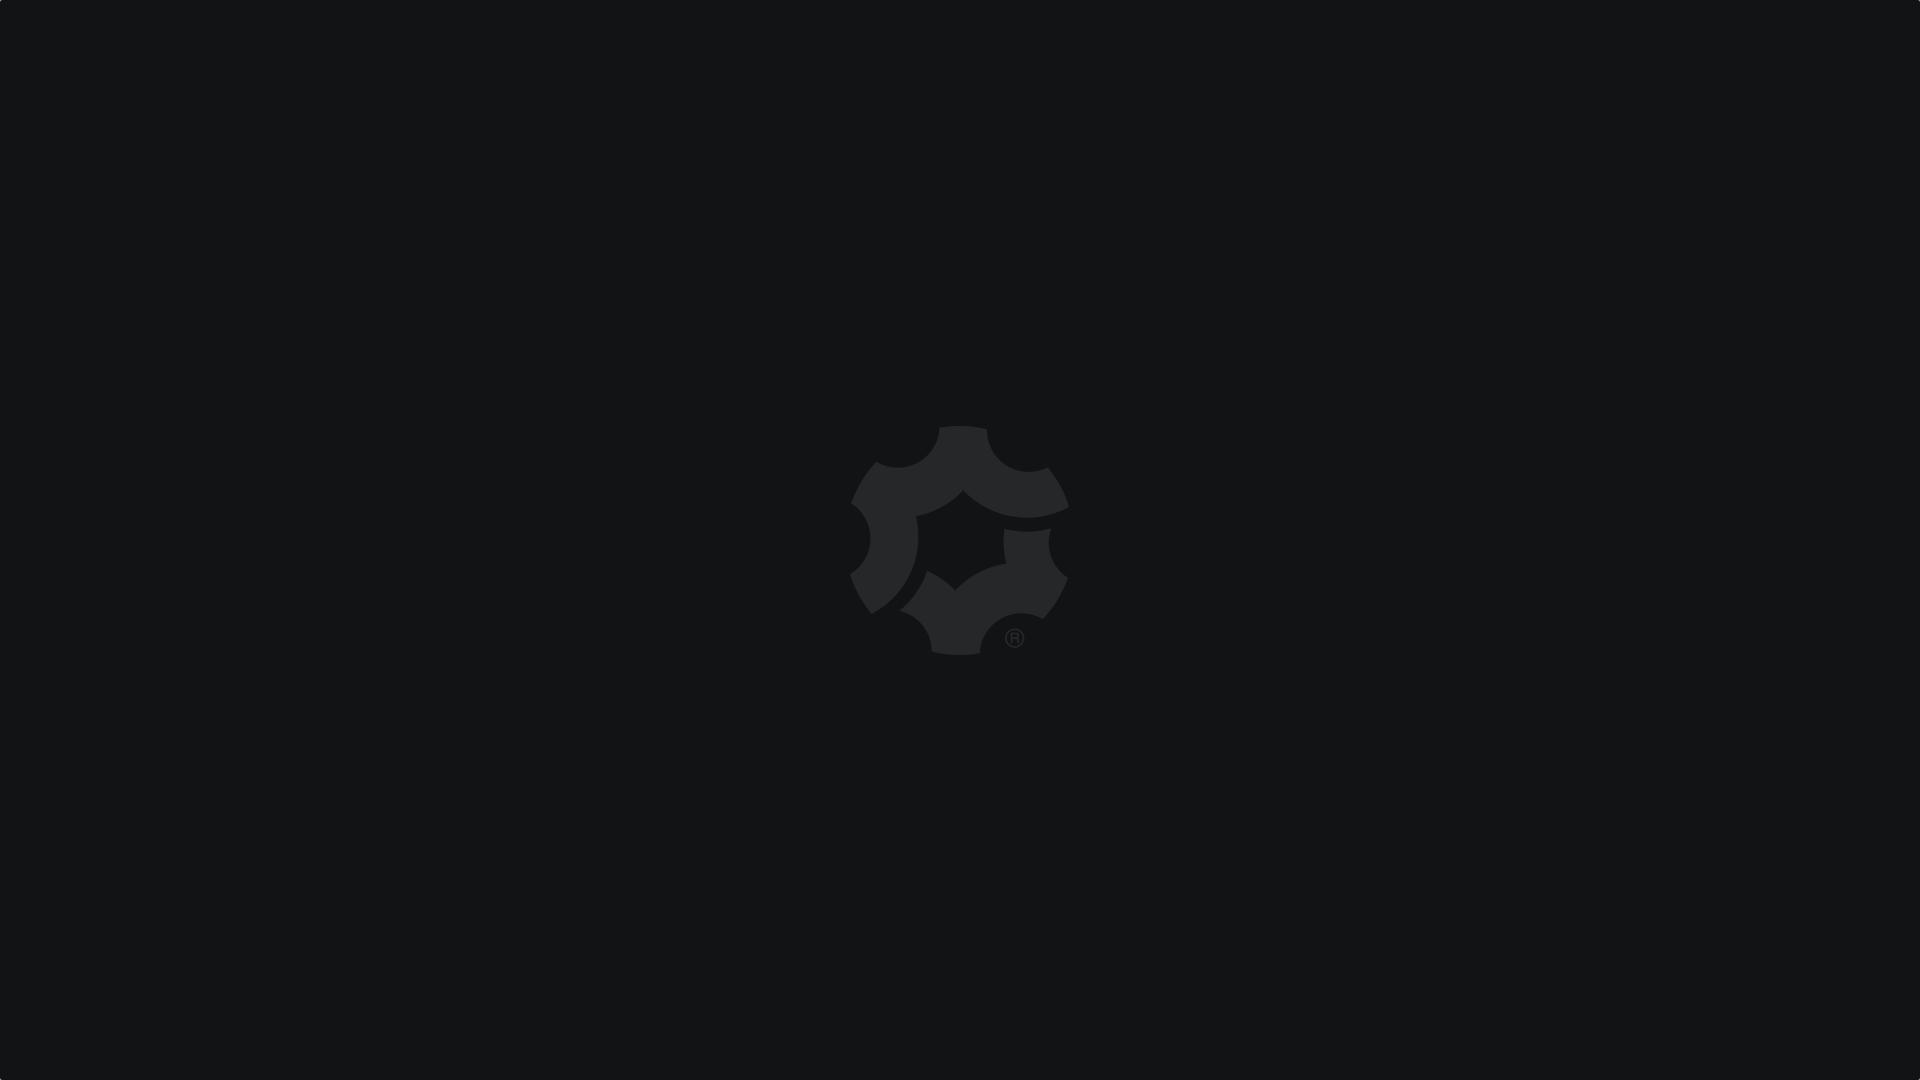 mod.io launch games